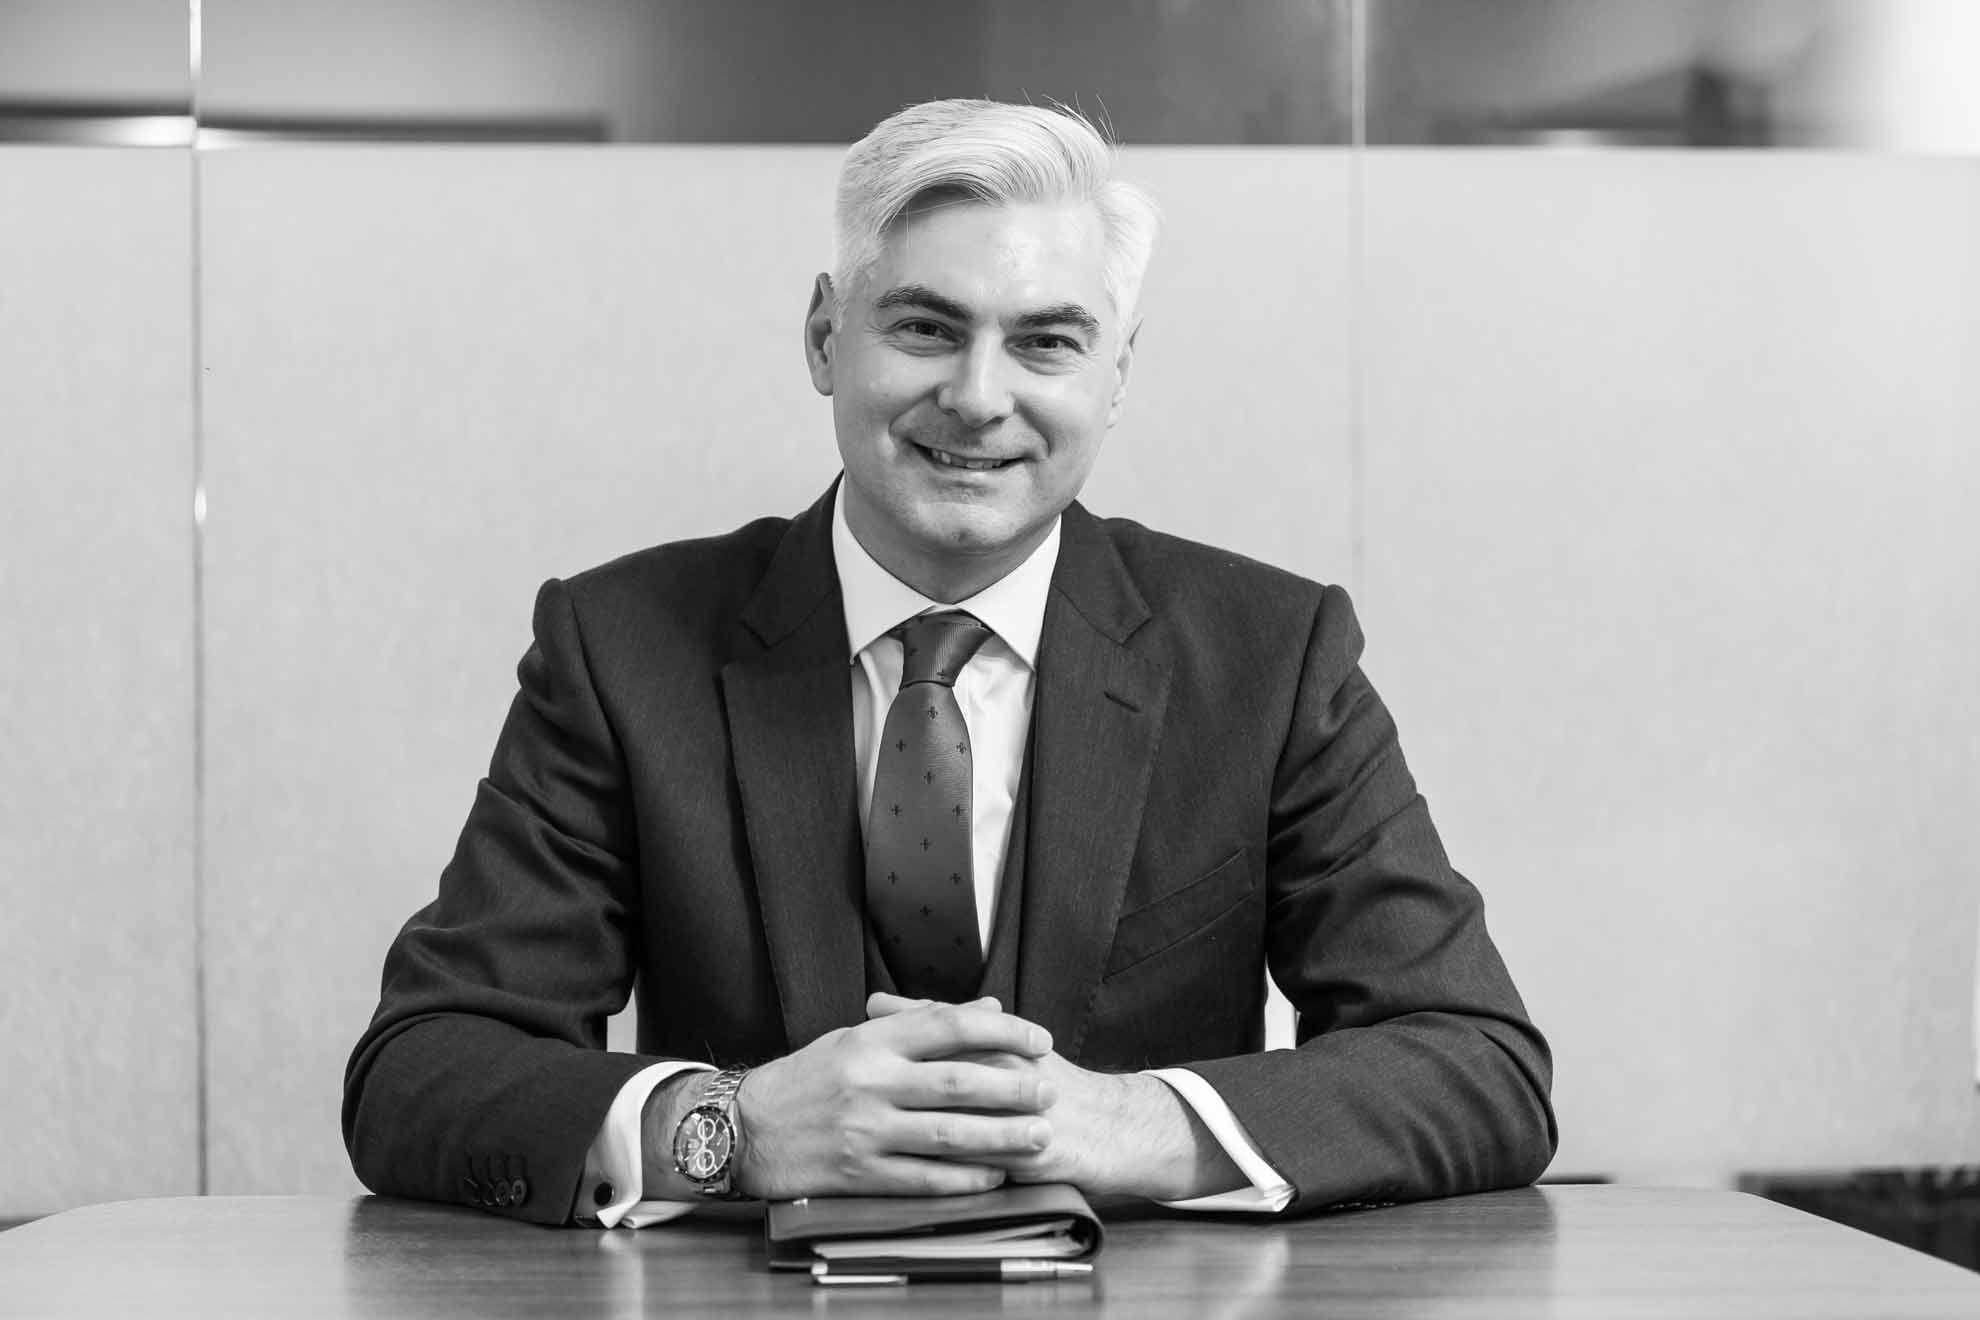 Goran Samuel Pesic, President and CEO of Samuel Associates